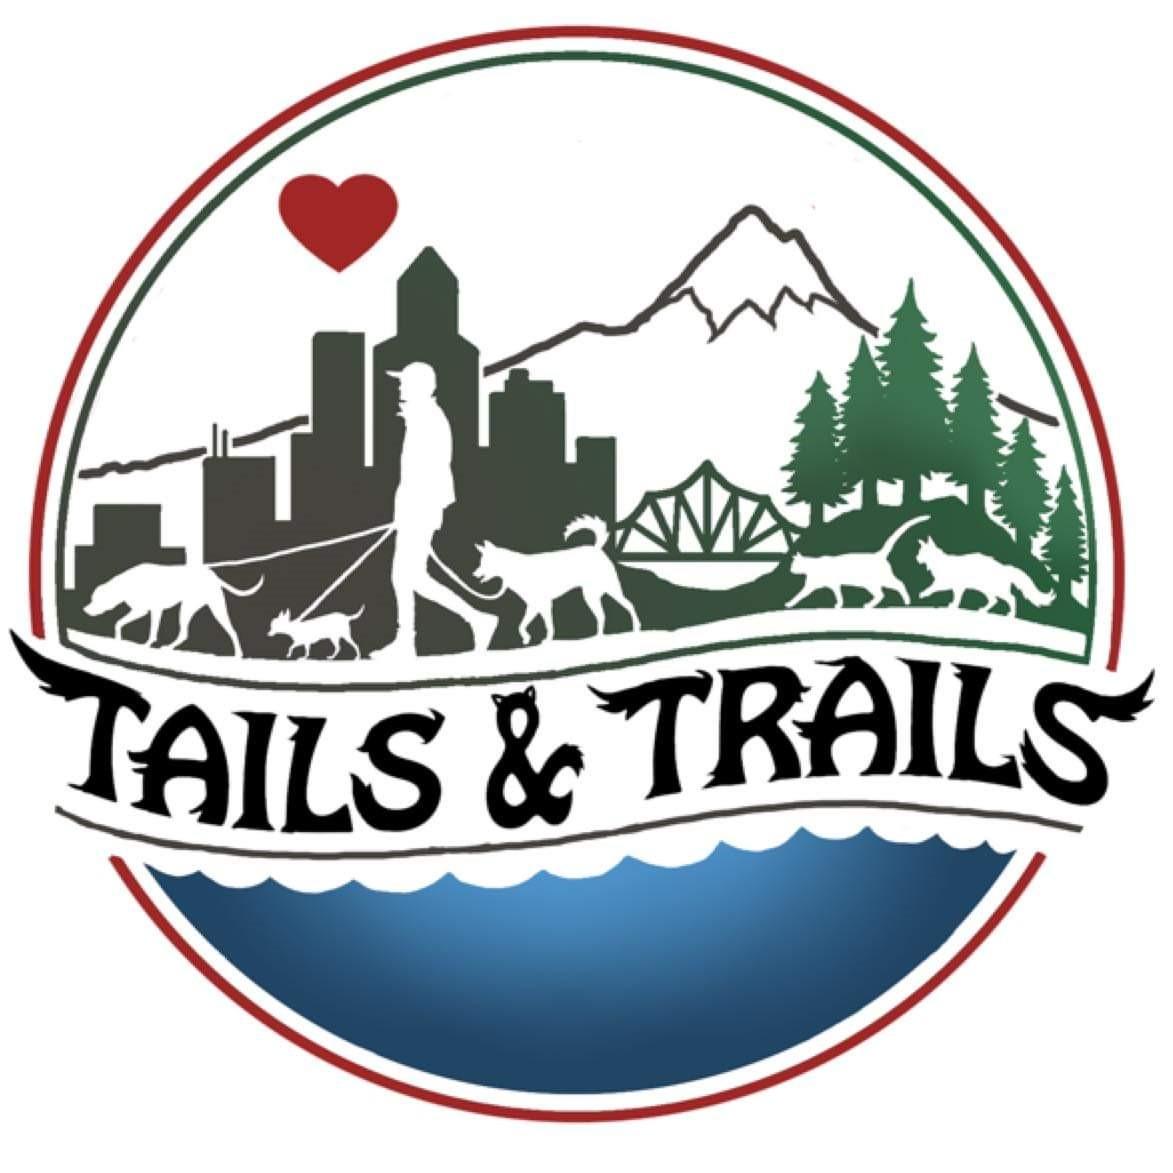 Tails & Trails Inc